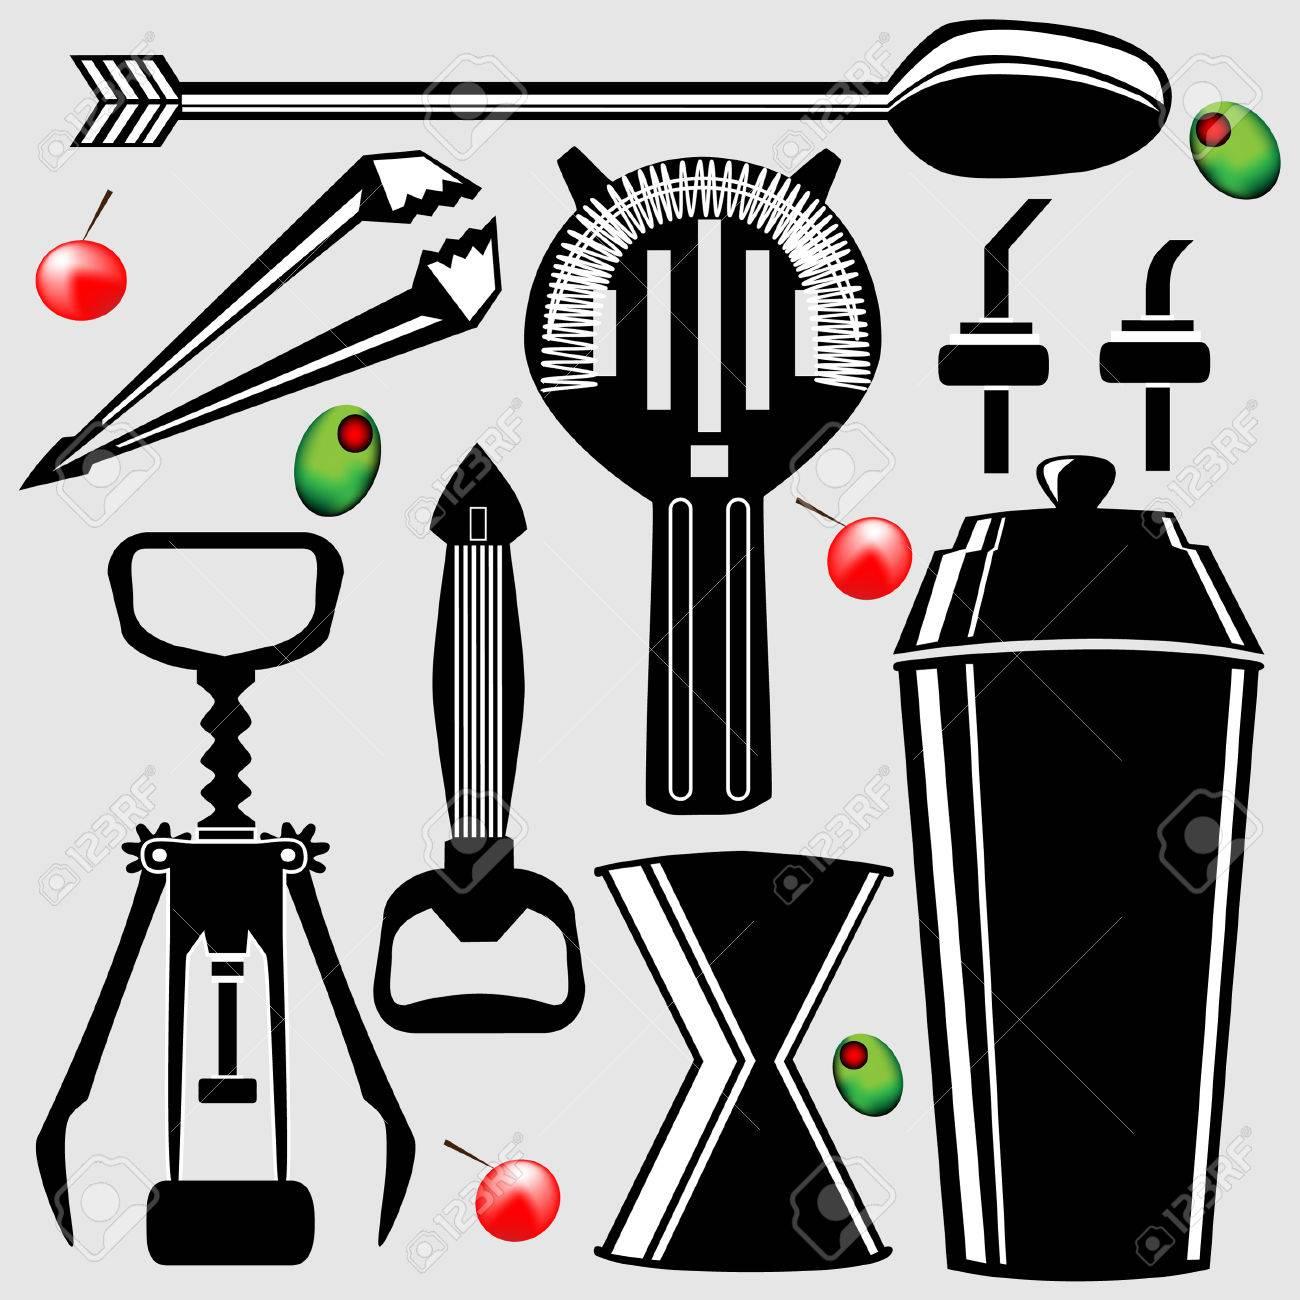 Bartending Tools In Vector Silhouette - Corkscrew, Shaker ...